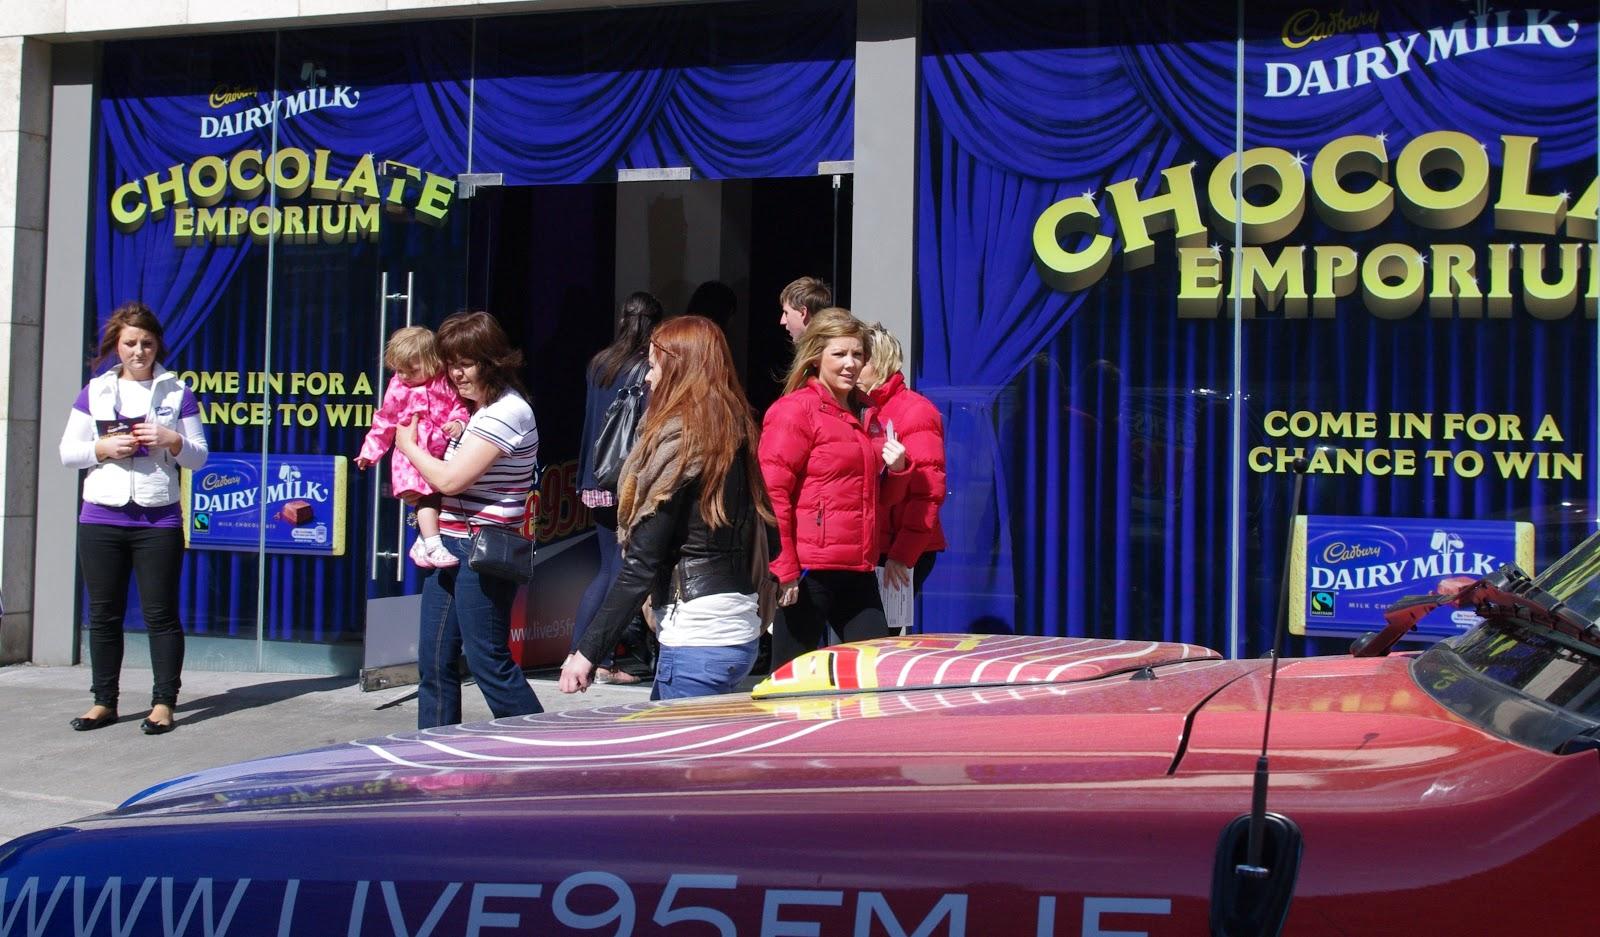 Cadbury Chocolate Emporium Promotion live 95 fm Limerick